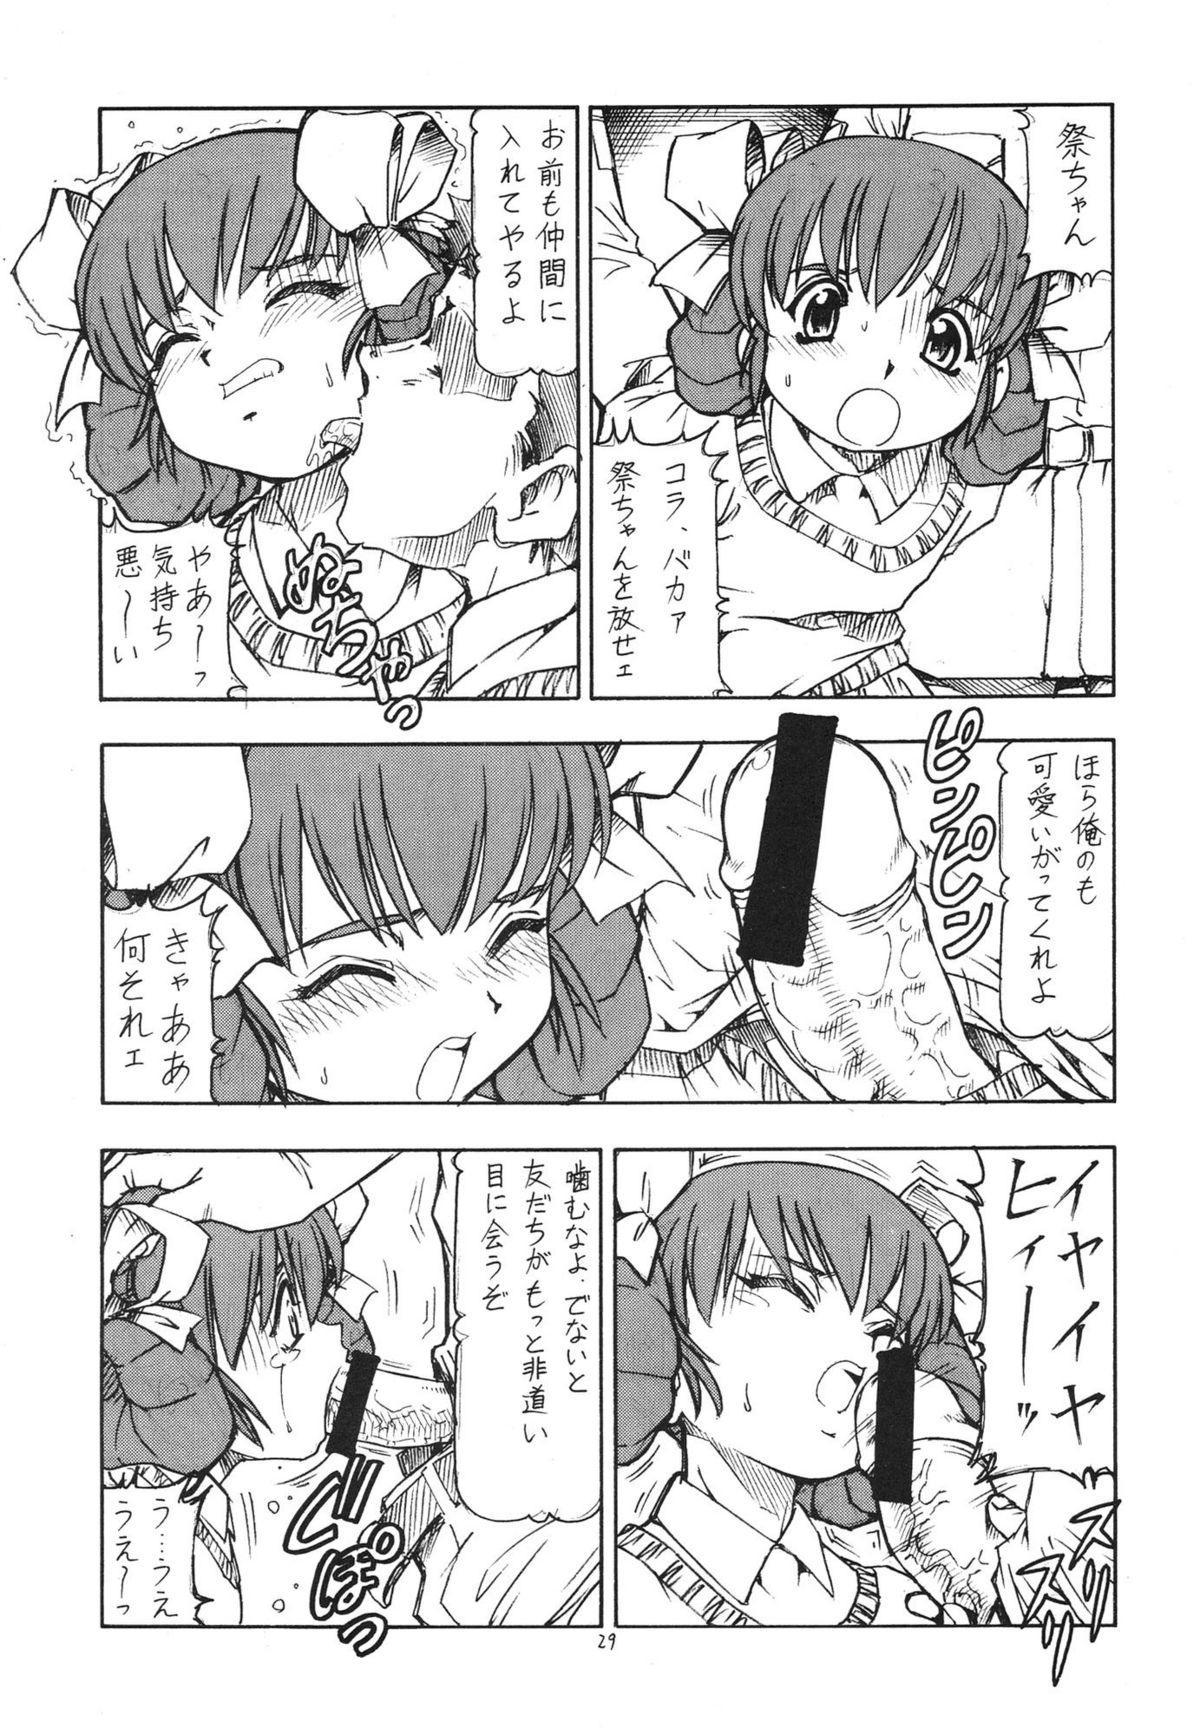 GPM.XXX Animation Moegiiro no Namida - Tear Drops 30